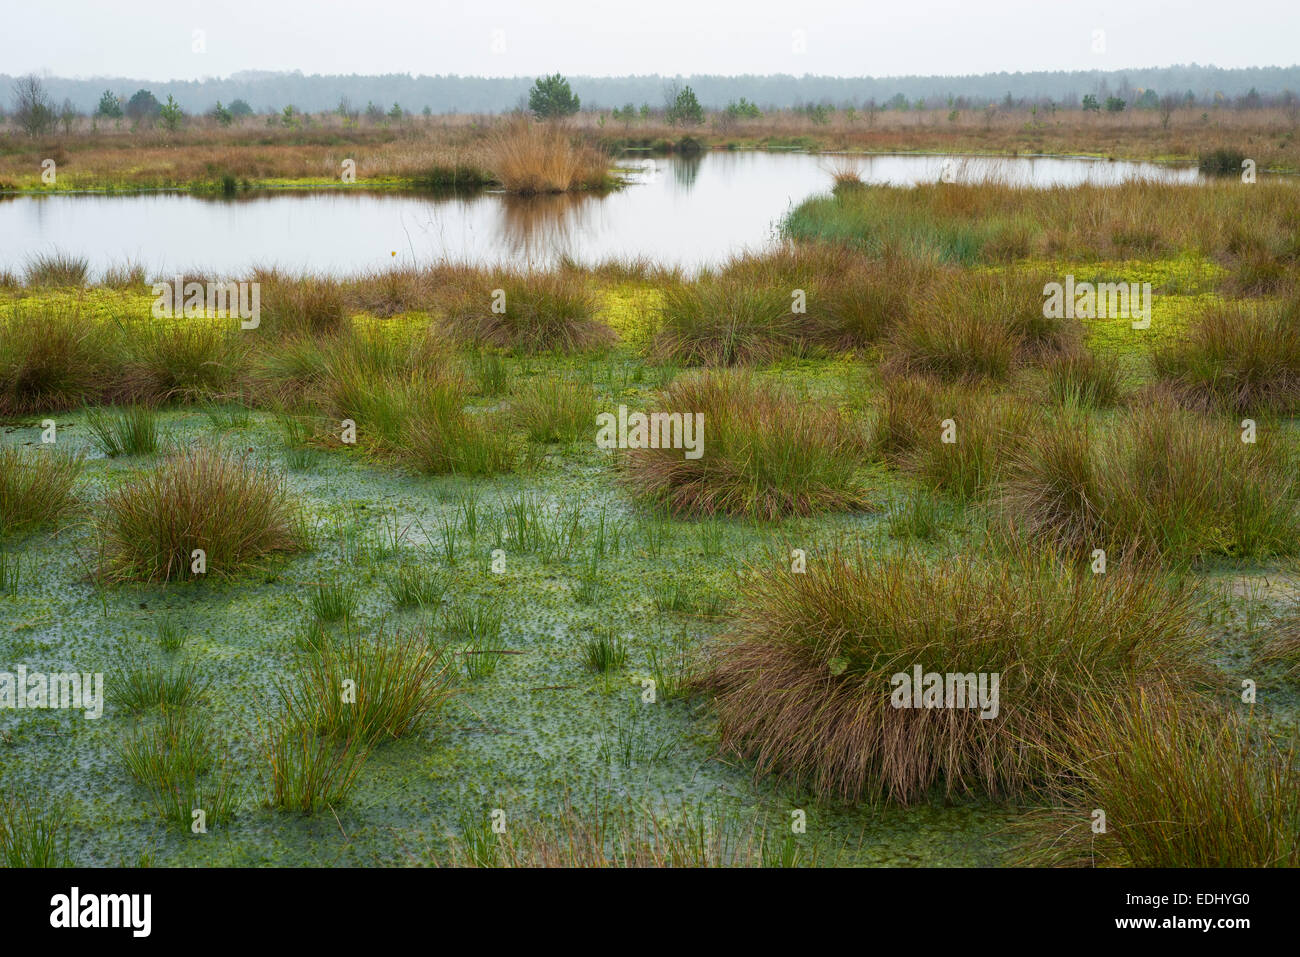 Peat Moss (Sphagnum sp.) and Soft Rush or Common Rush (Juncus effusus), Schweimker Moor Nature Reserve, Lower Saxony, - Stock Image